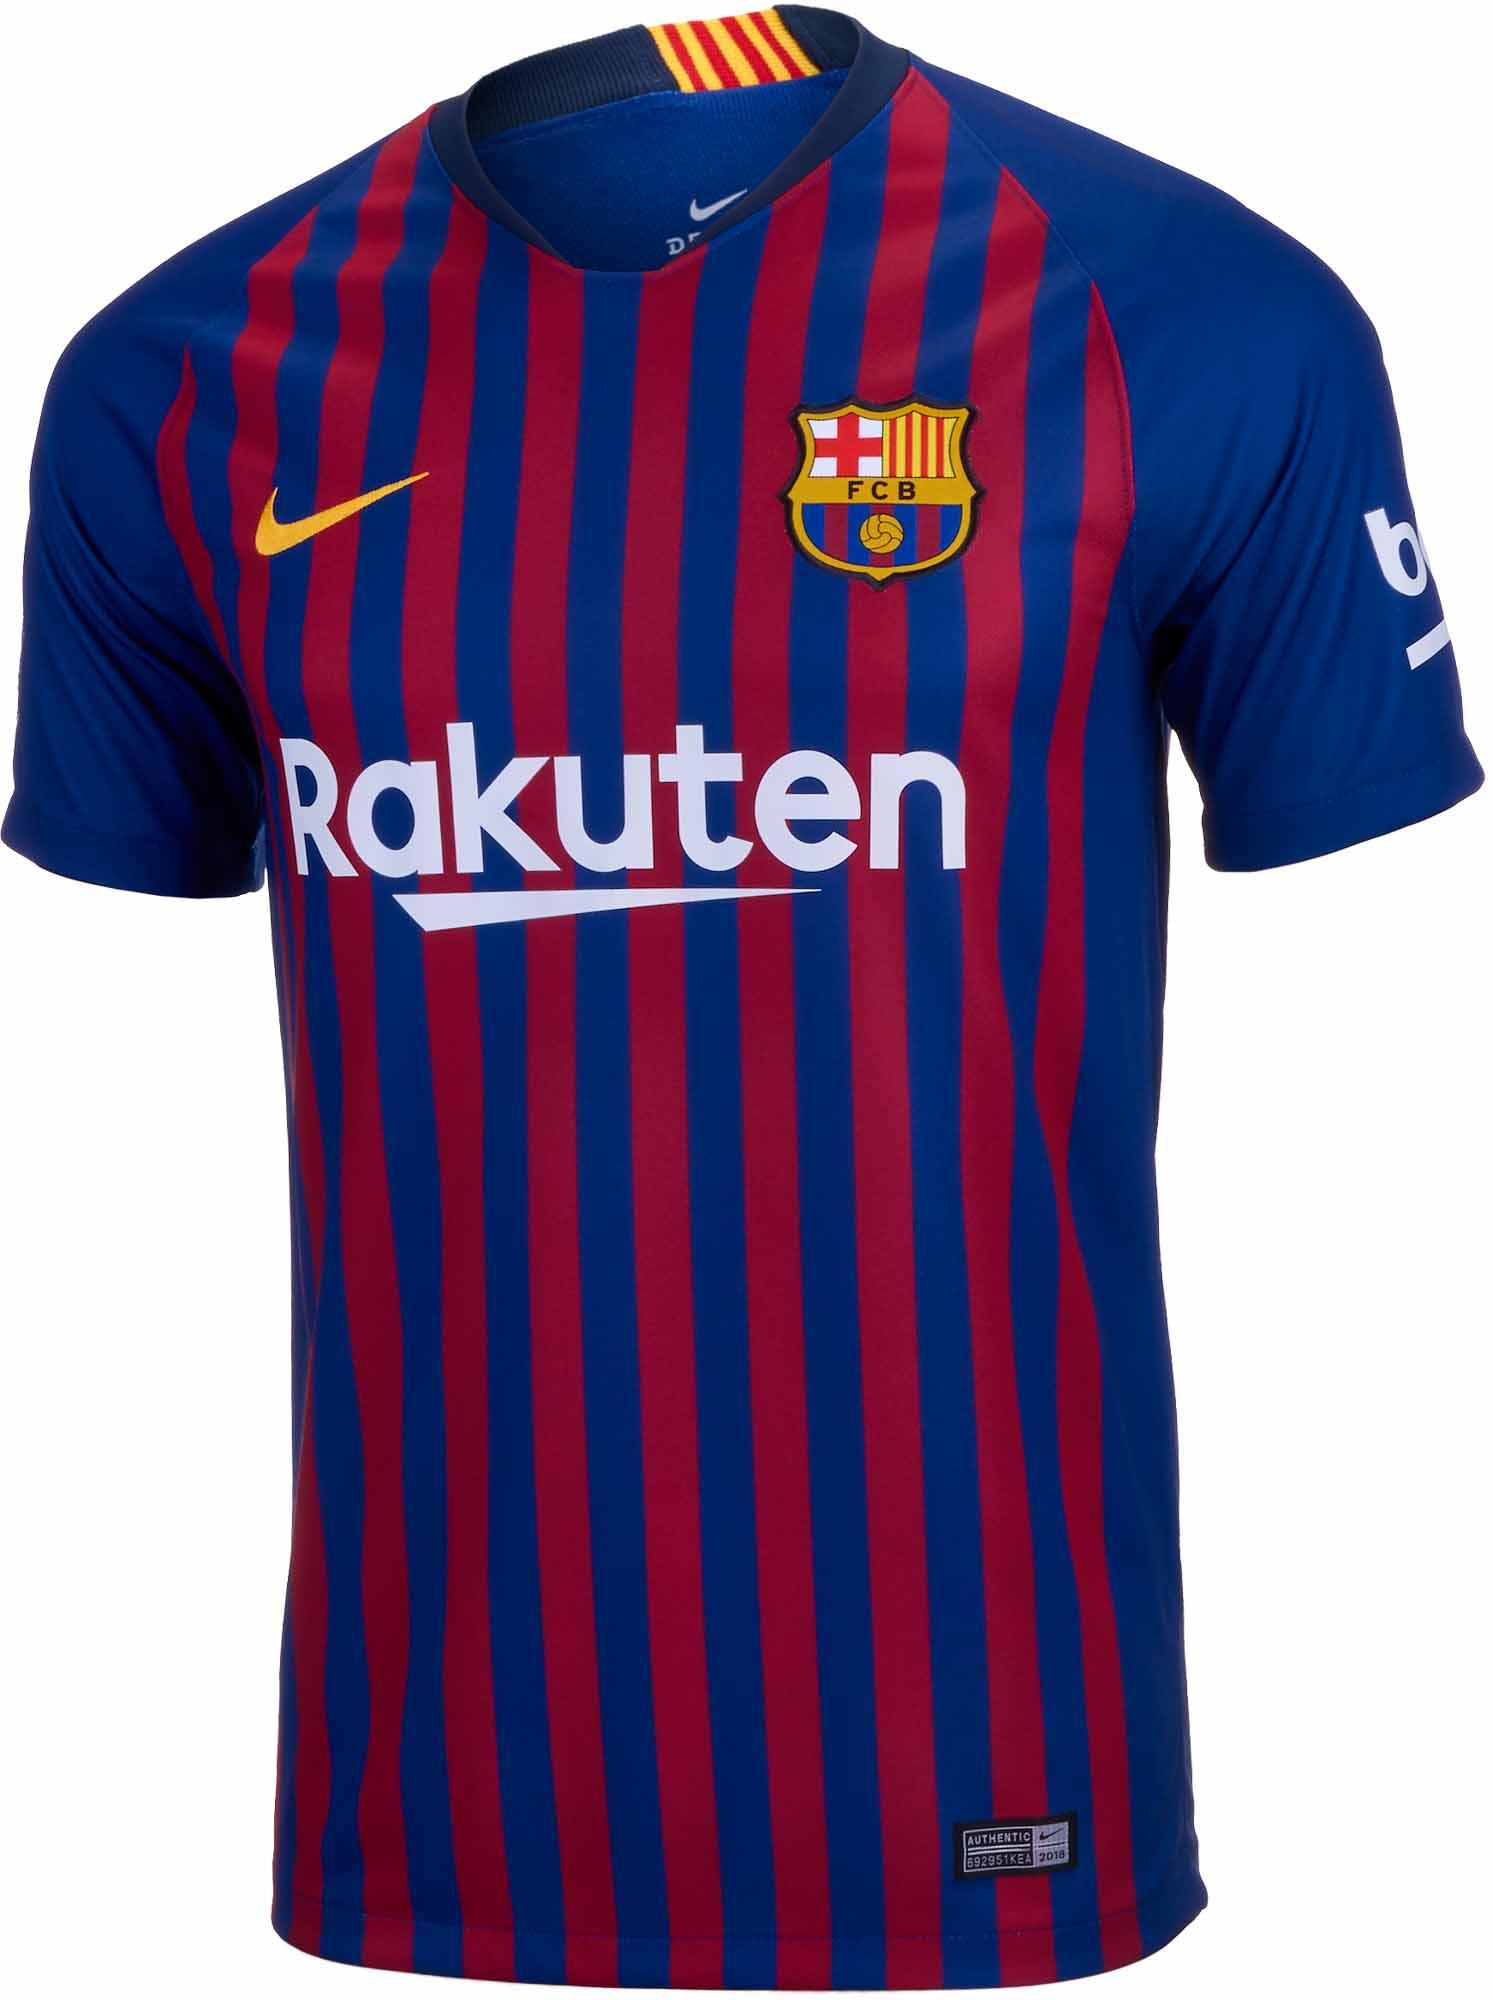 973a6cd6919 Nike Barcelona Home Jersey 2018-19 - SoccerPro